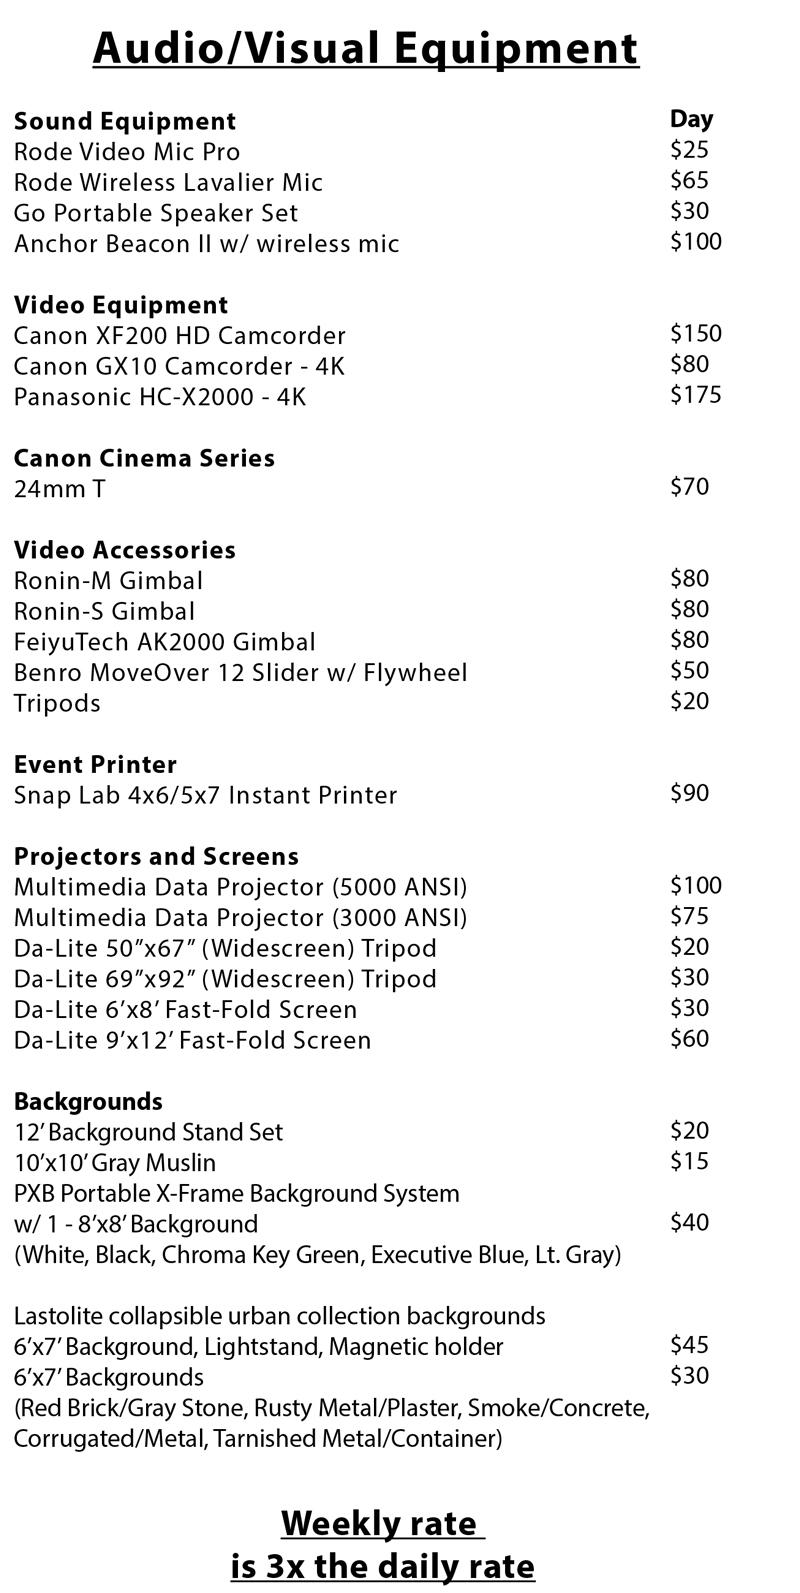 Audio/Video Equipment Rental List